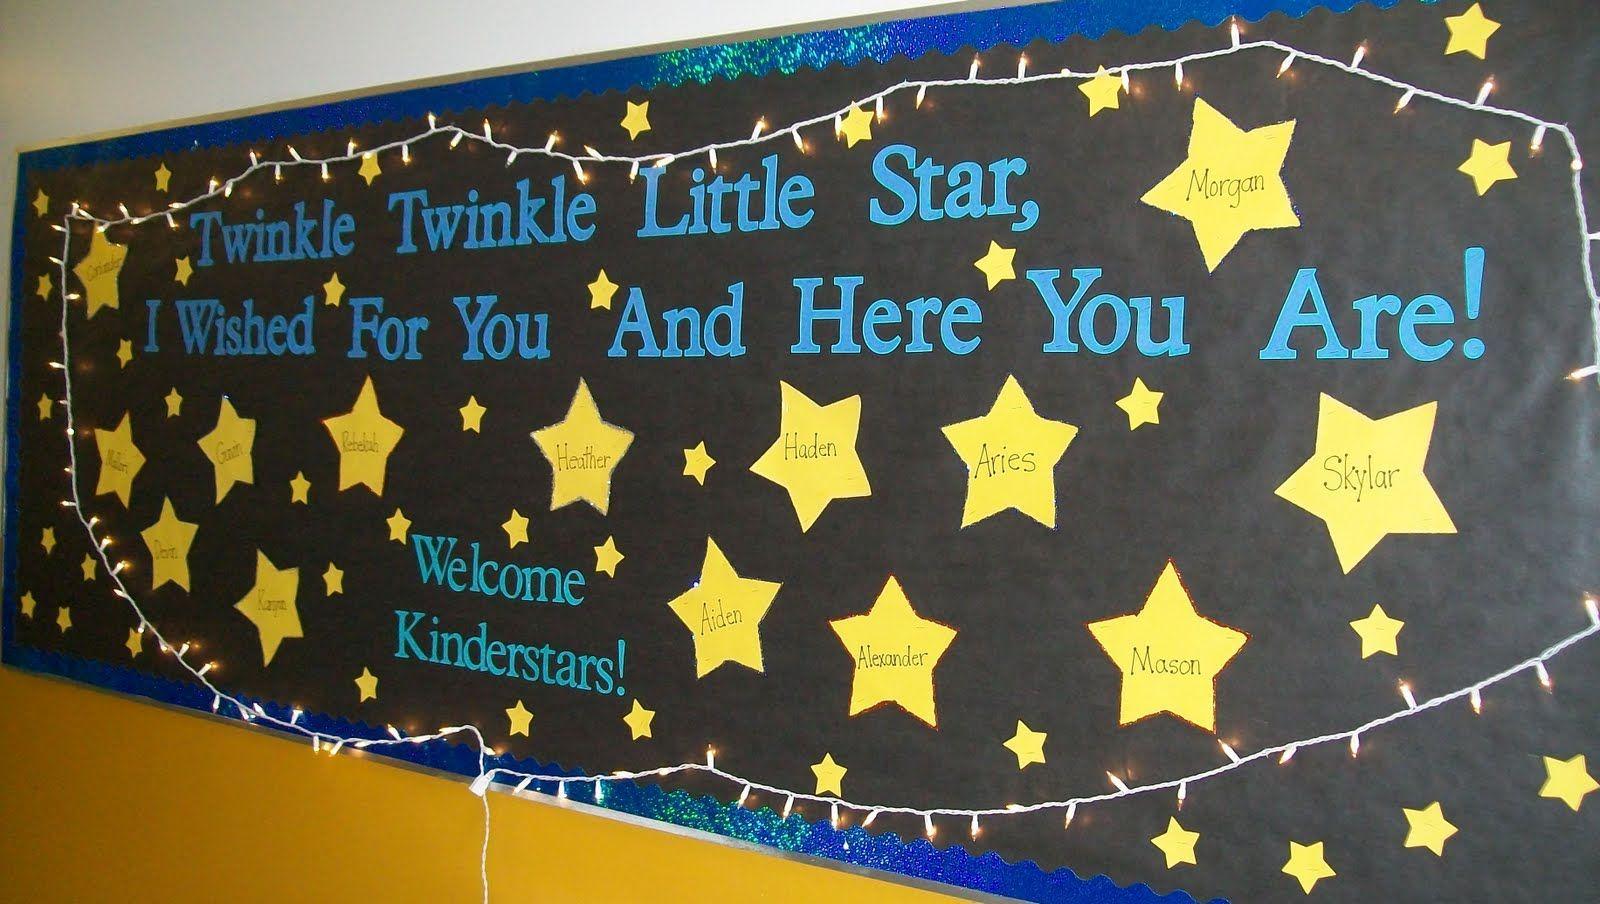 Welcome Back To School Bulletin Boards Ideas | Miss Wells' Buckaroos: Welcome to Kindergarten Bulletin Board